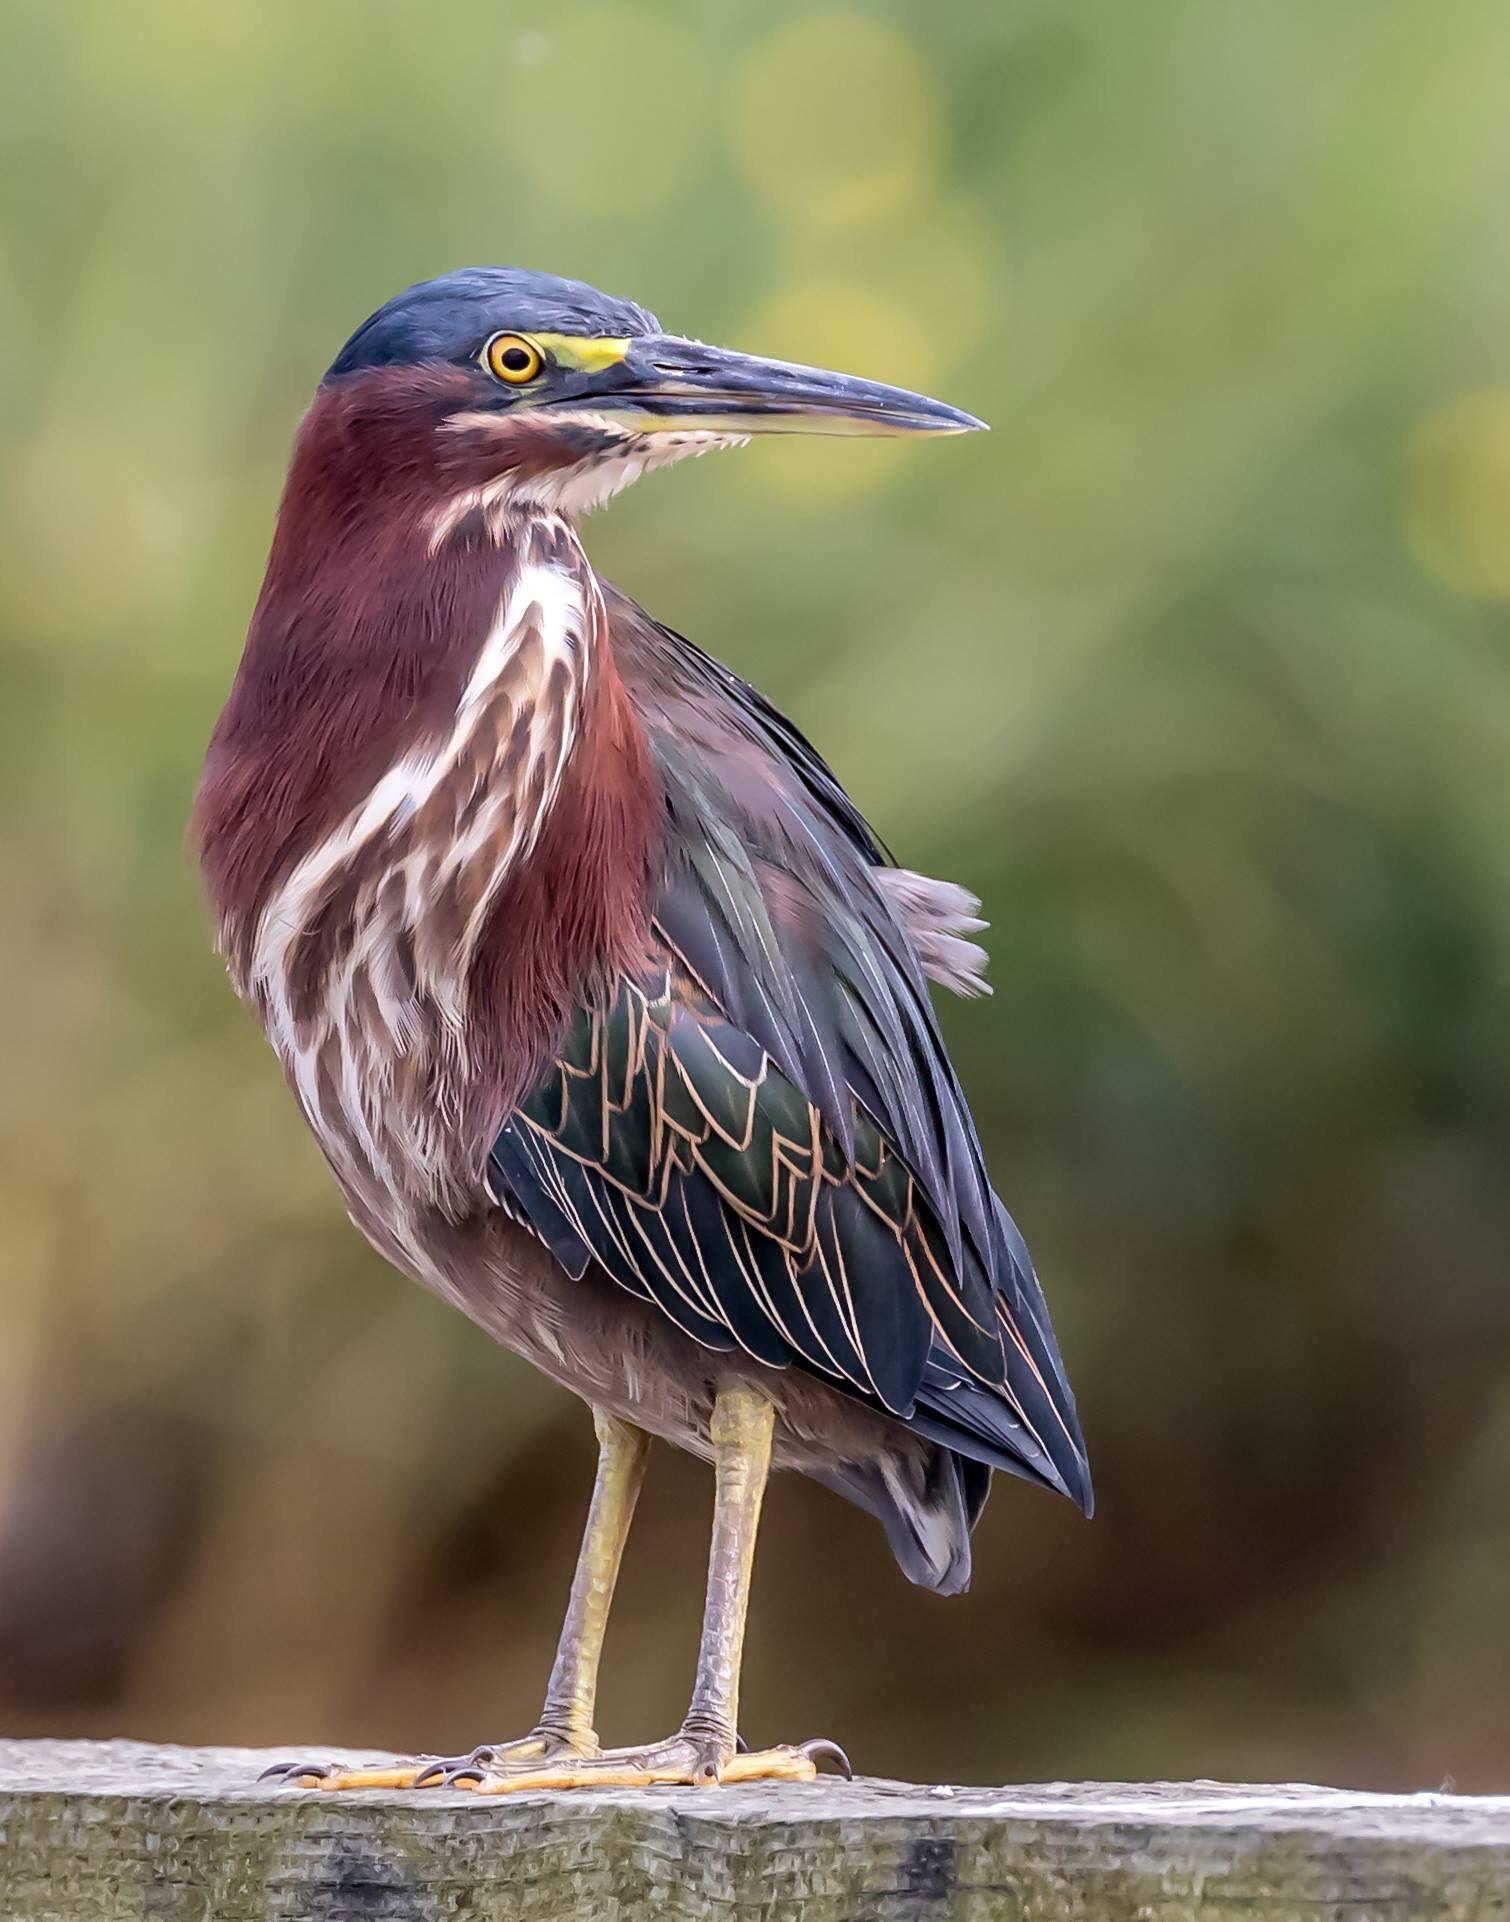 Little Green Heron by Don Young | Backyard birds, Bird pictures, Green heron